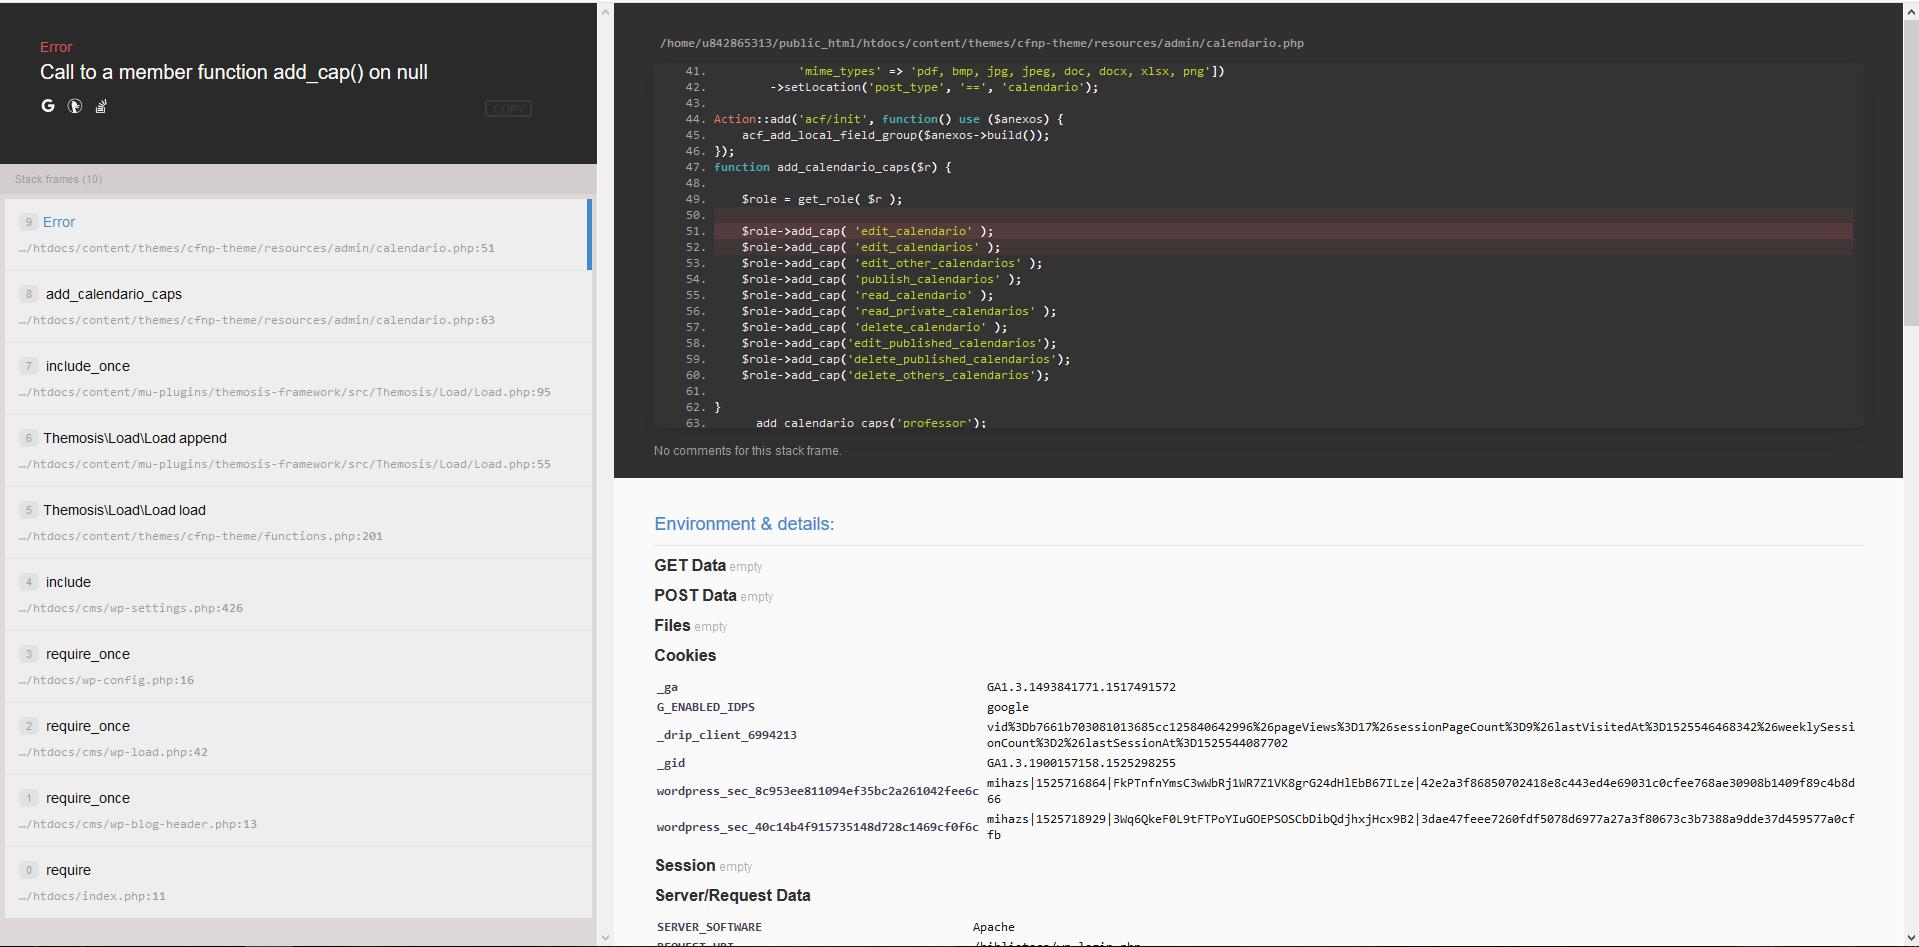 Calendario Php.Multisite Wp Admin Subdirectory Install Redirect Loop